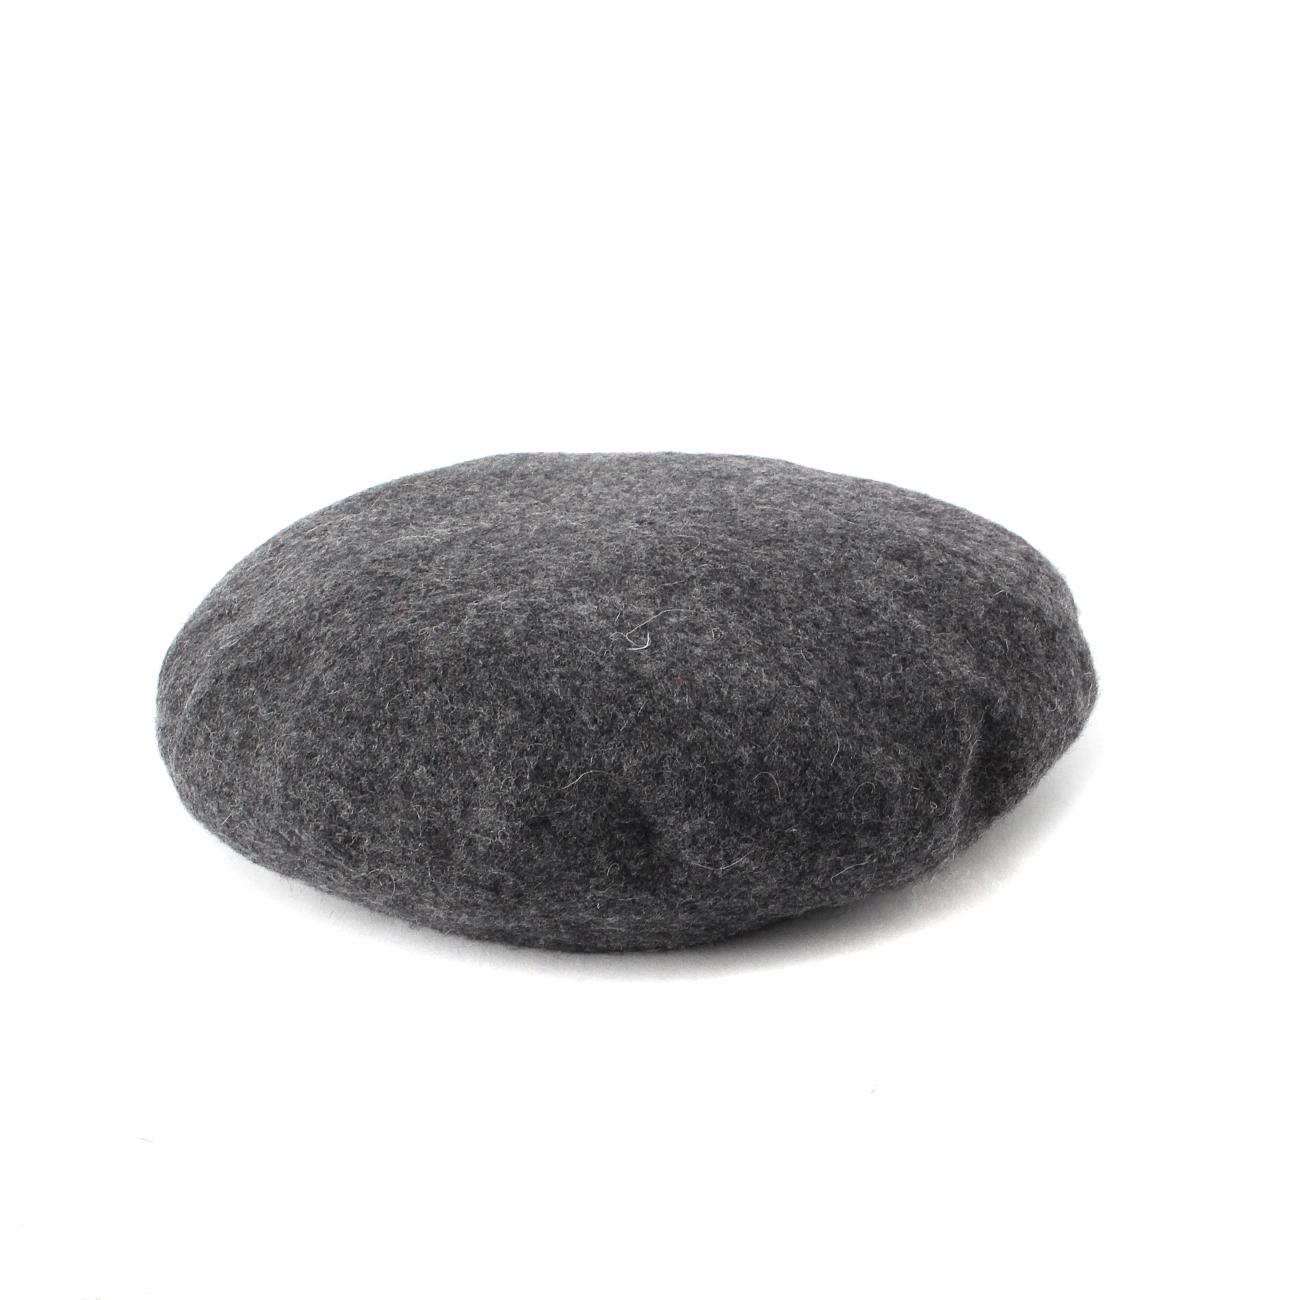 【OPAQUE.CLIP (オペークドットクリップ)】ベーシックベレー帽レディース 帽子 ハンチング・ベレー帽 チャコールグレー